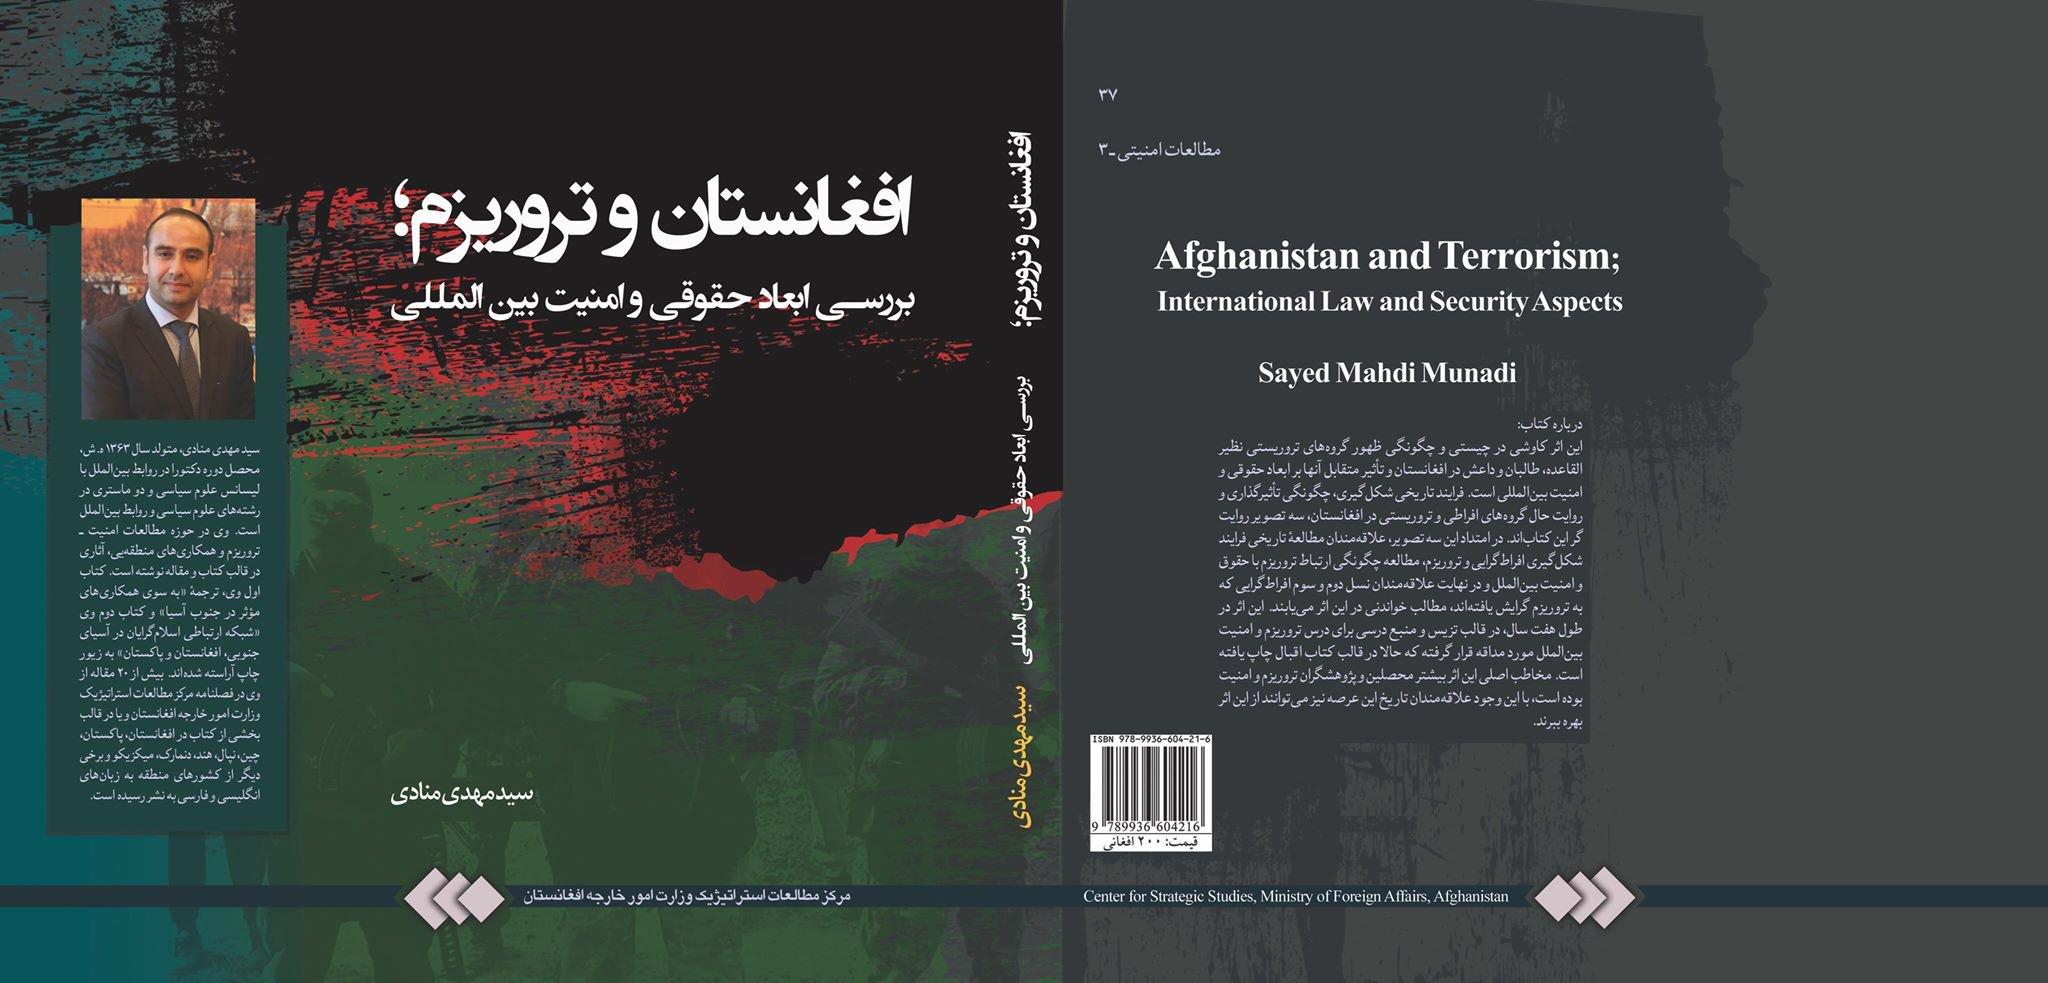 Afghanistan And Terorism by Sayed Mahdi Munadi